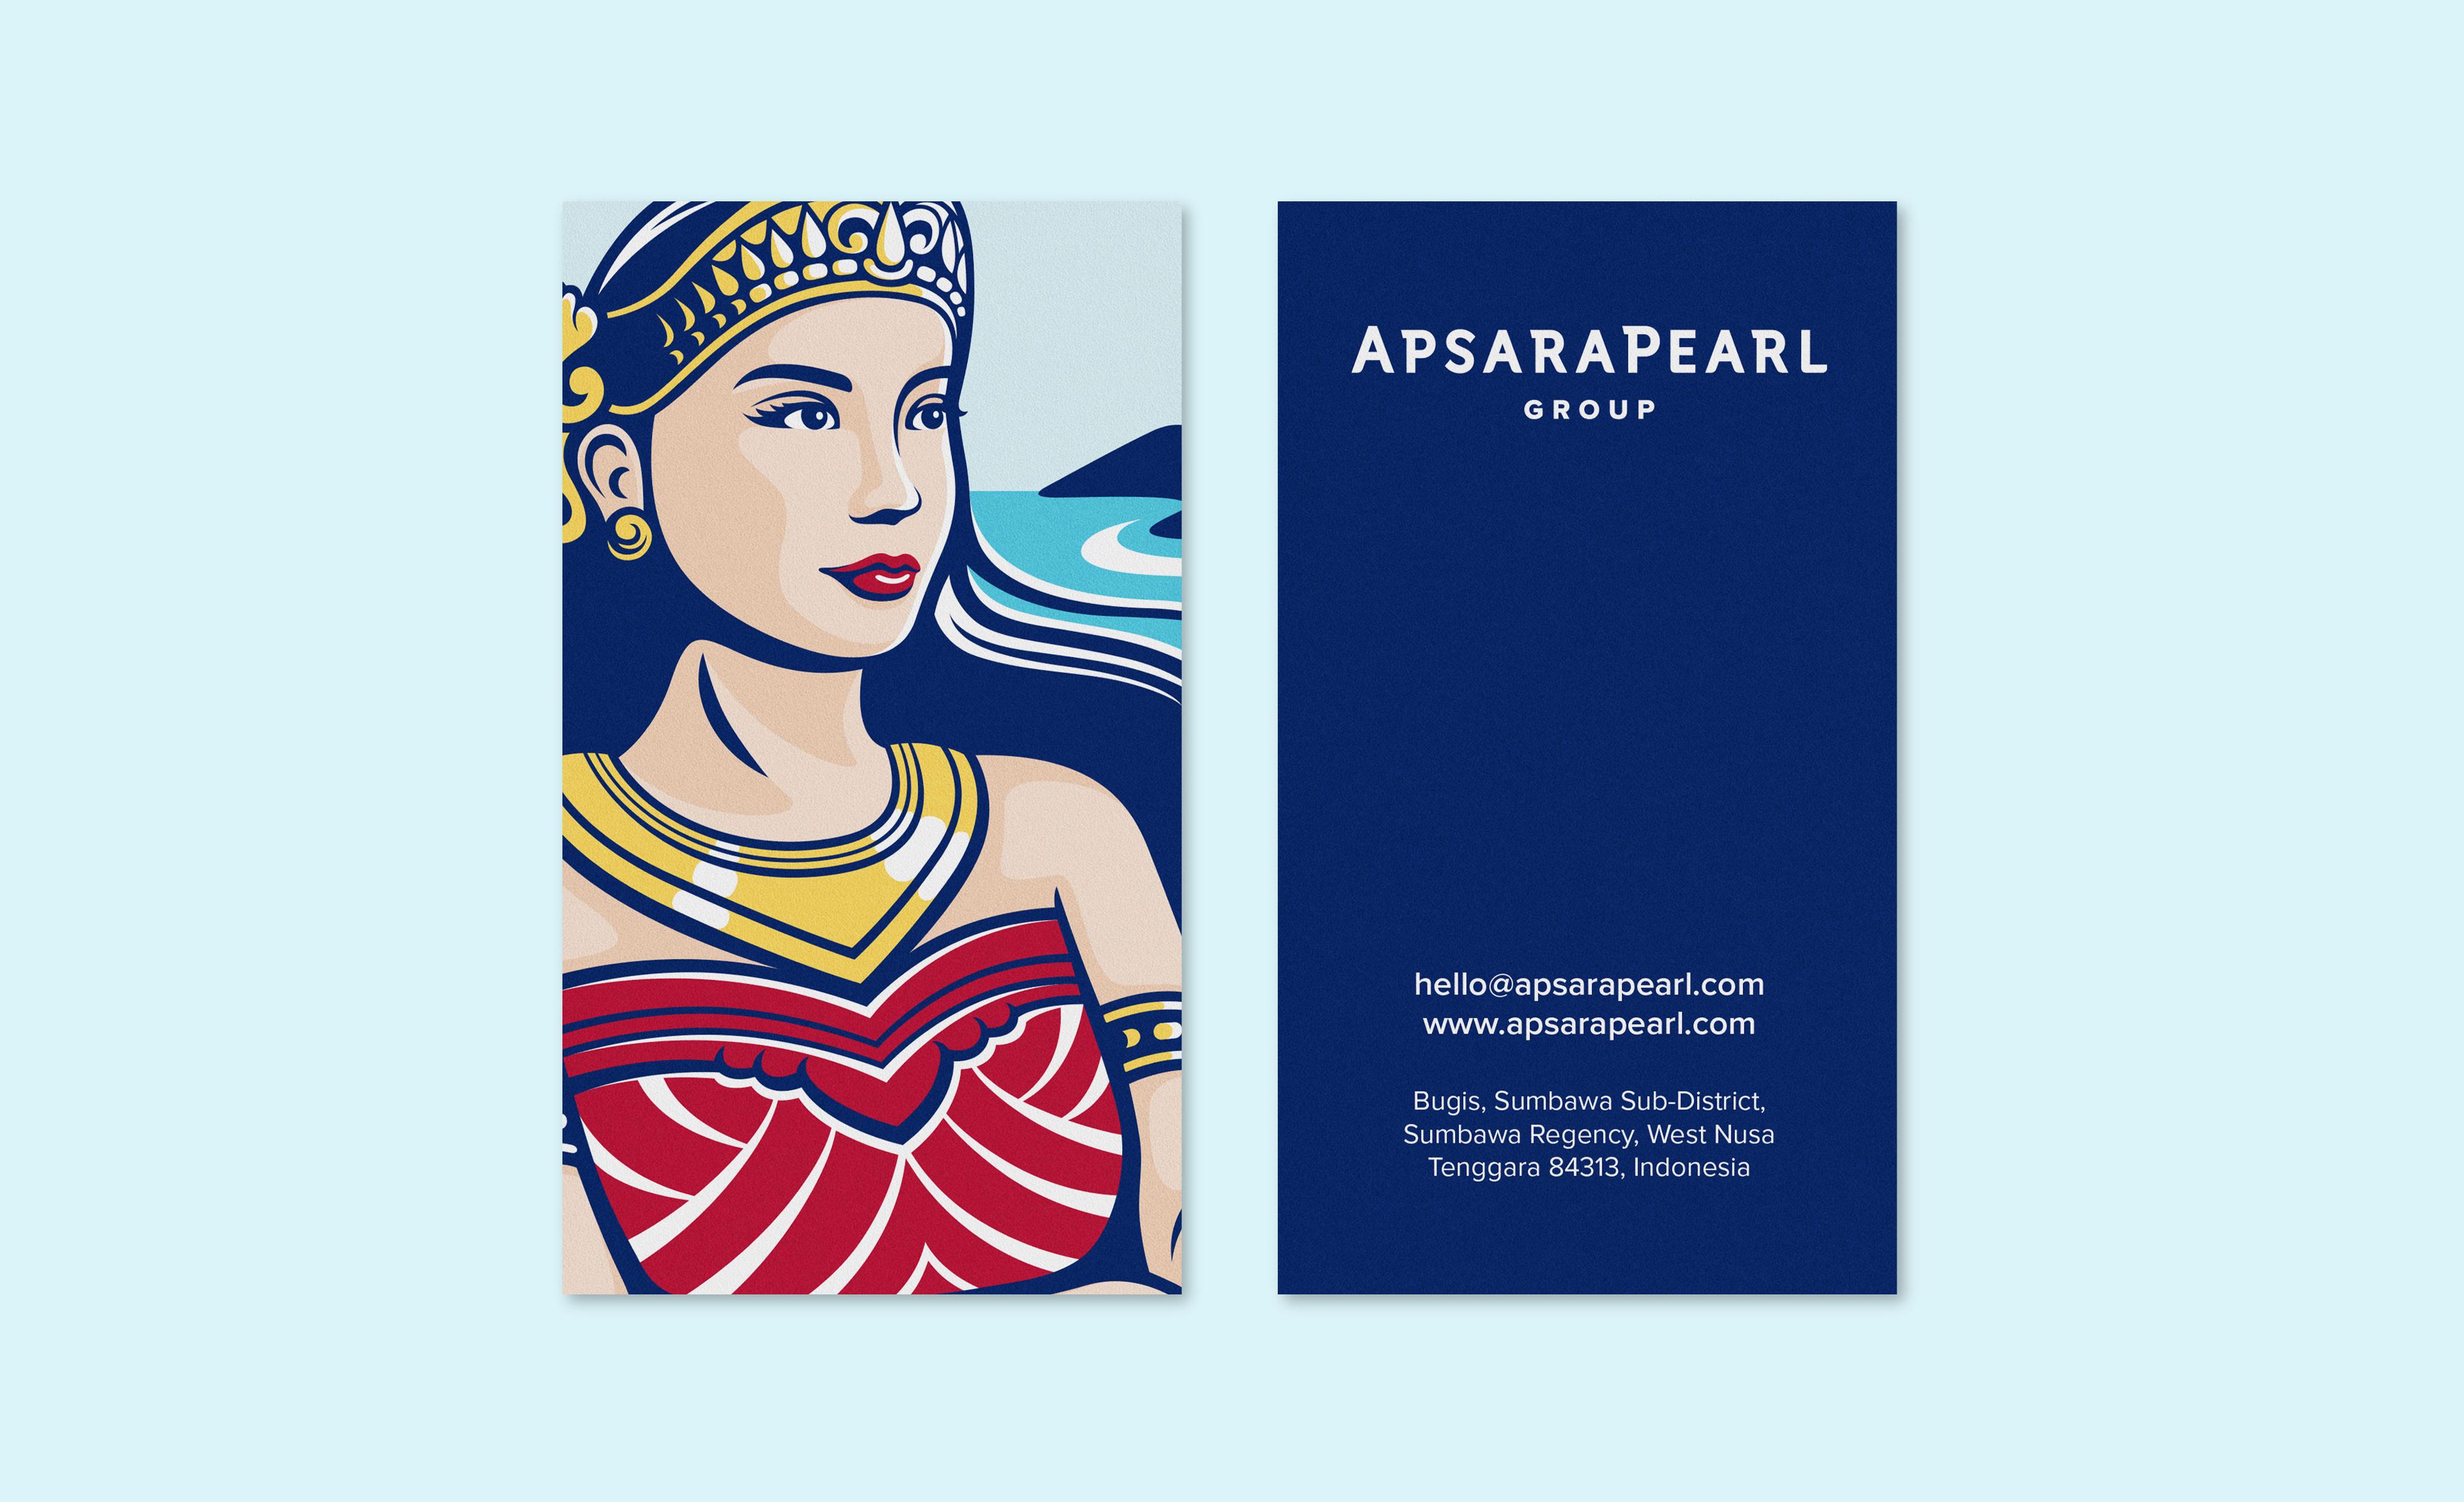 ApsaraPearl